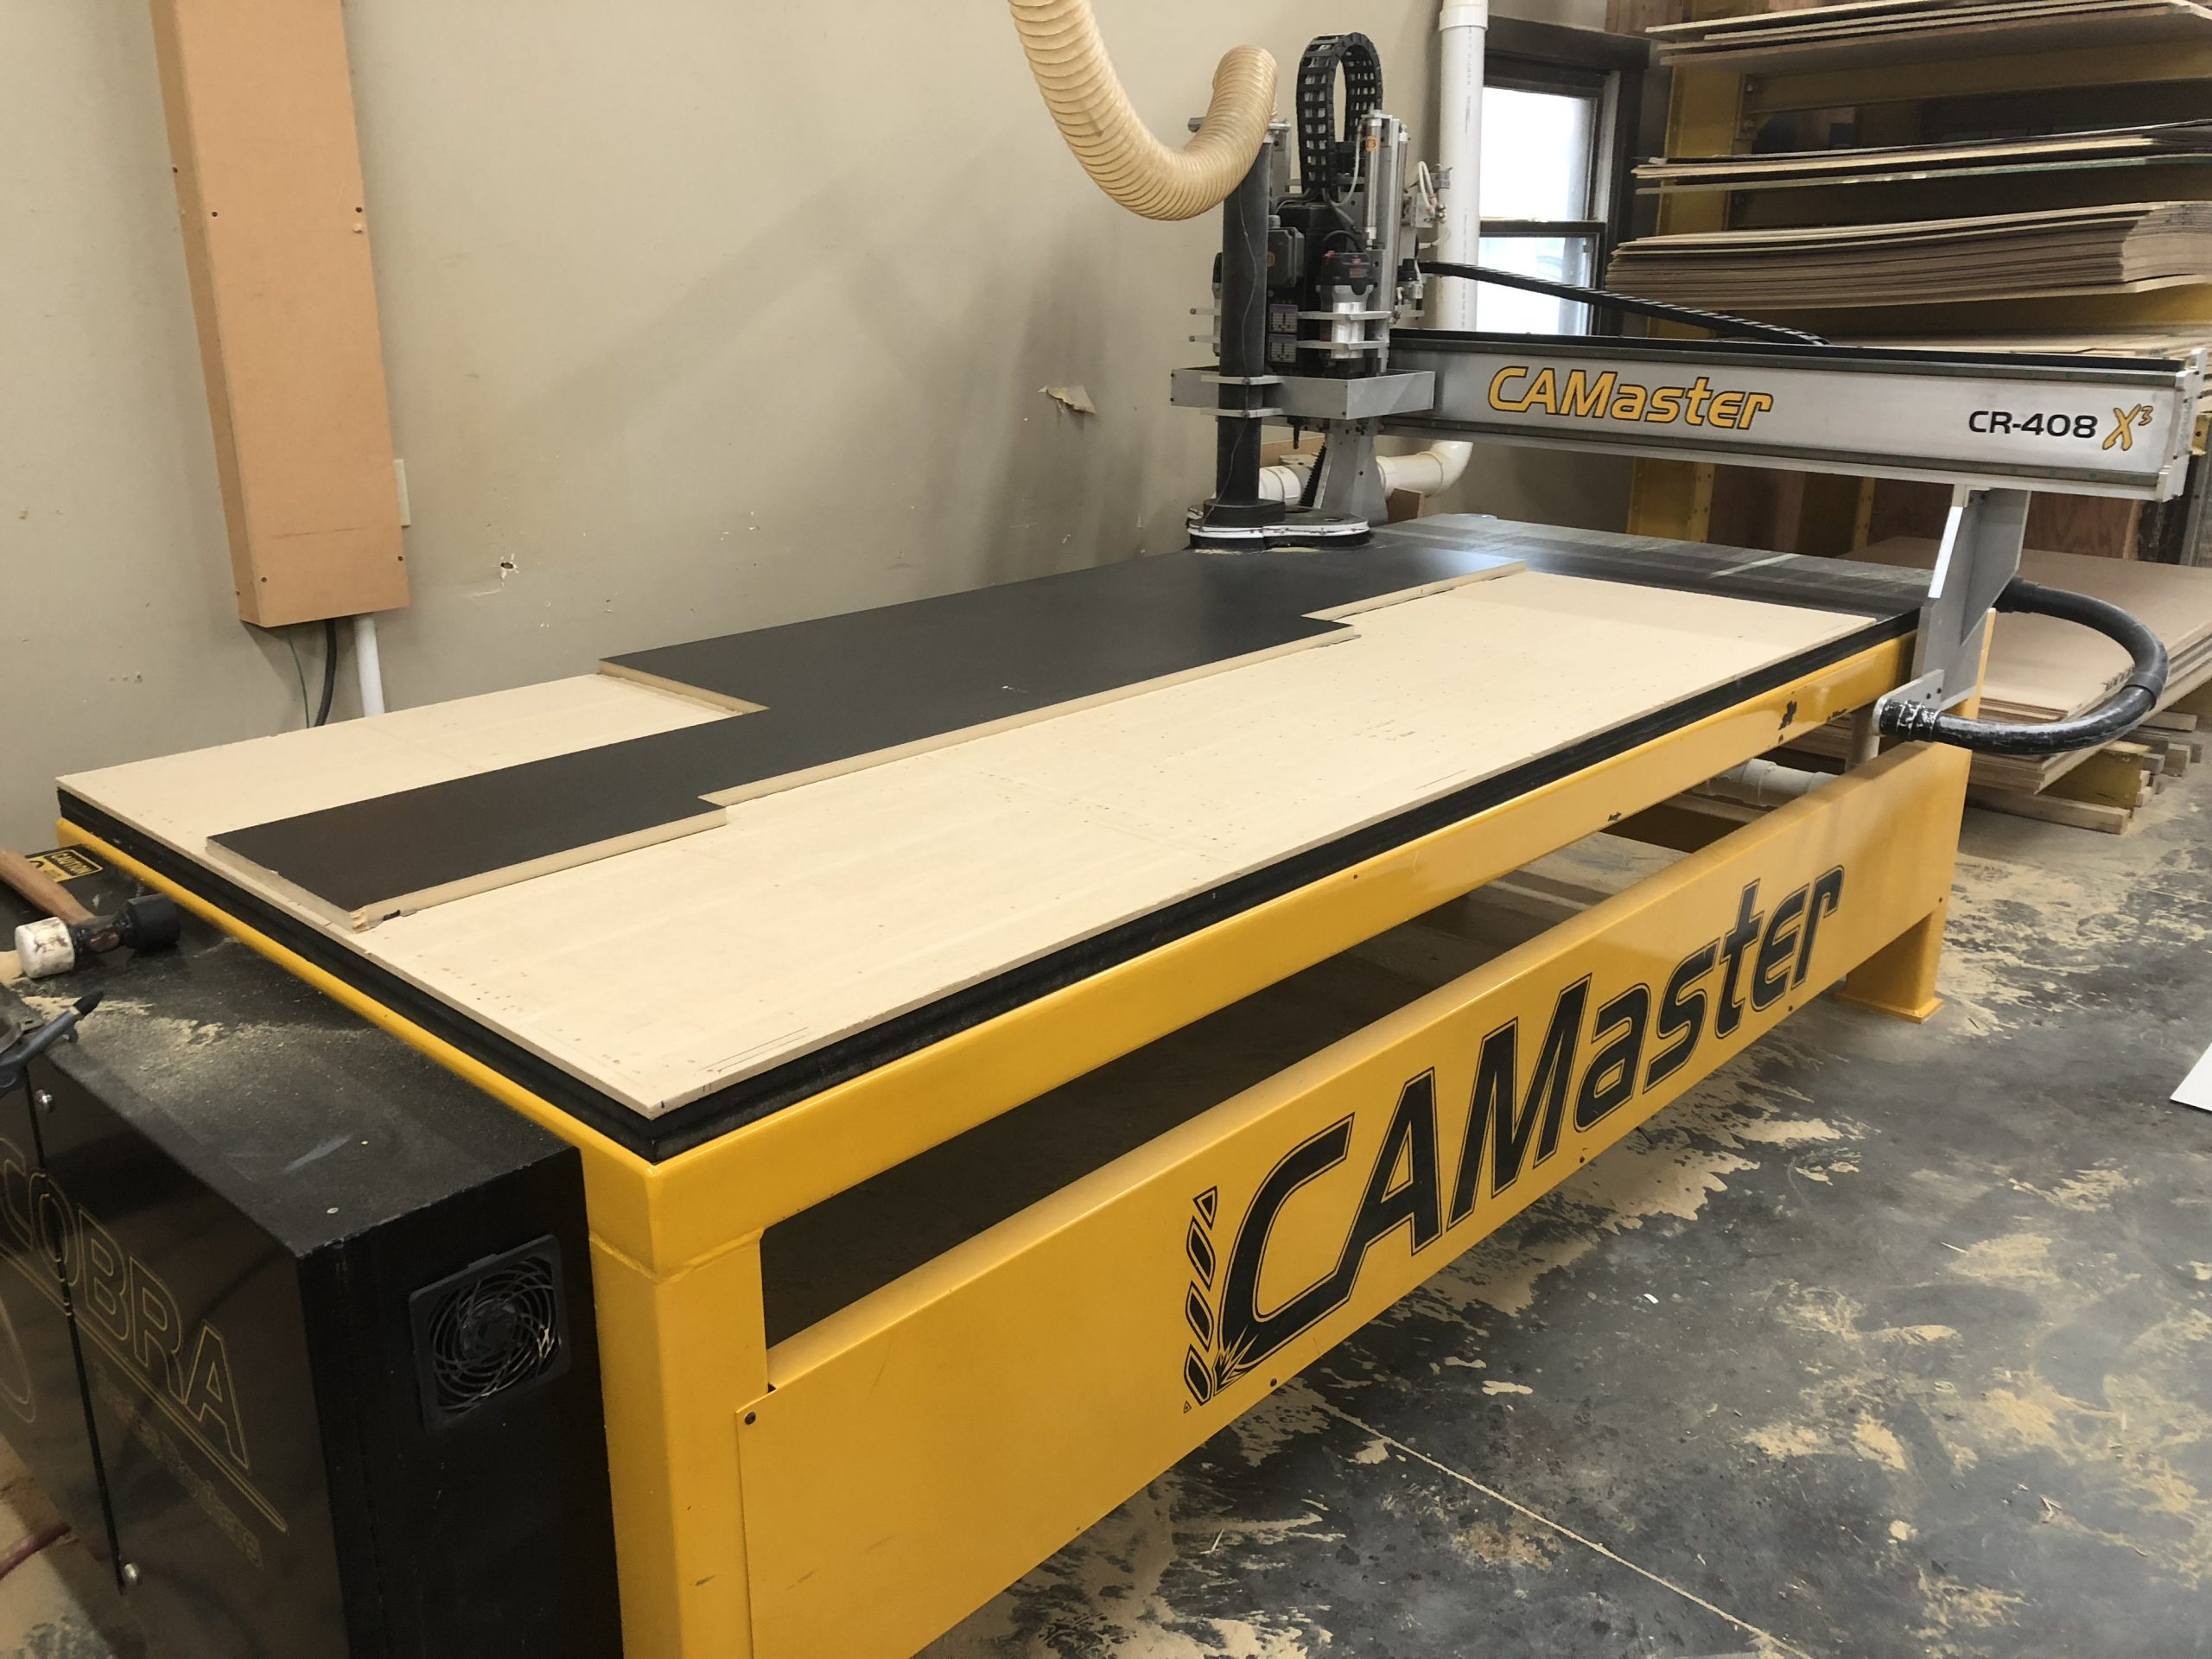 Cammaster 4x8 Cobra X3